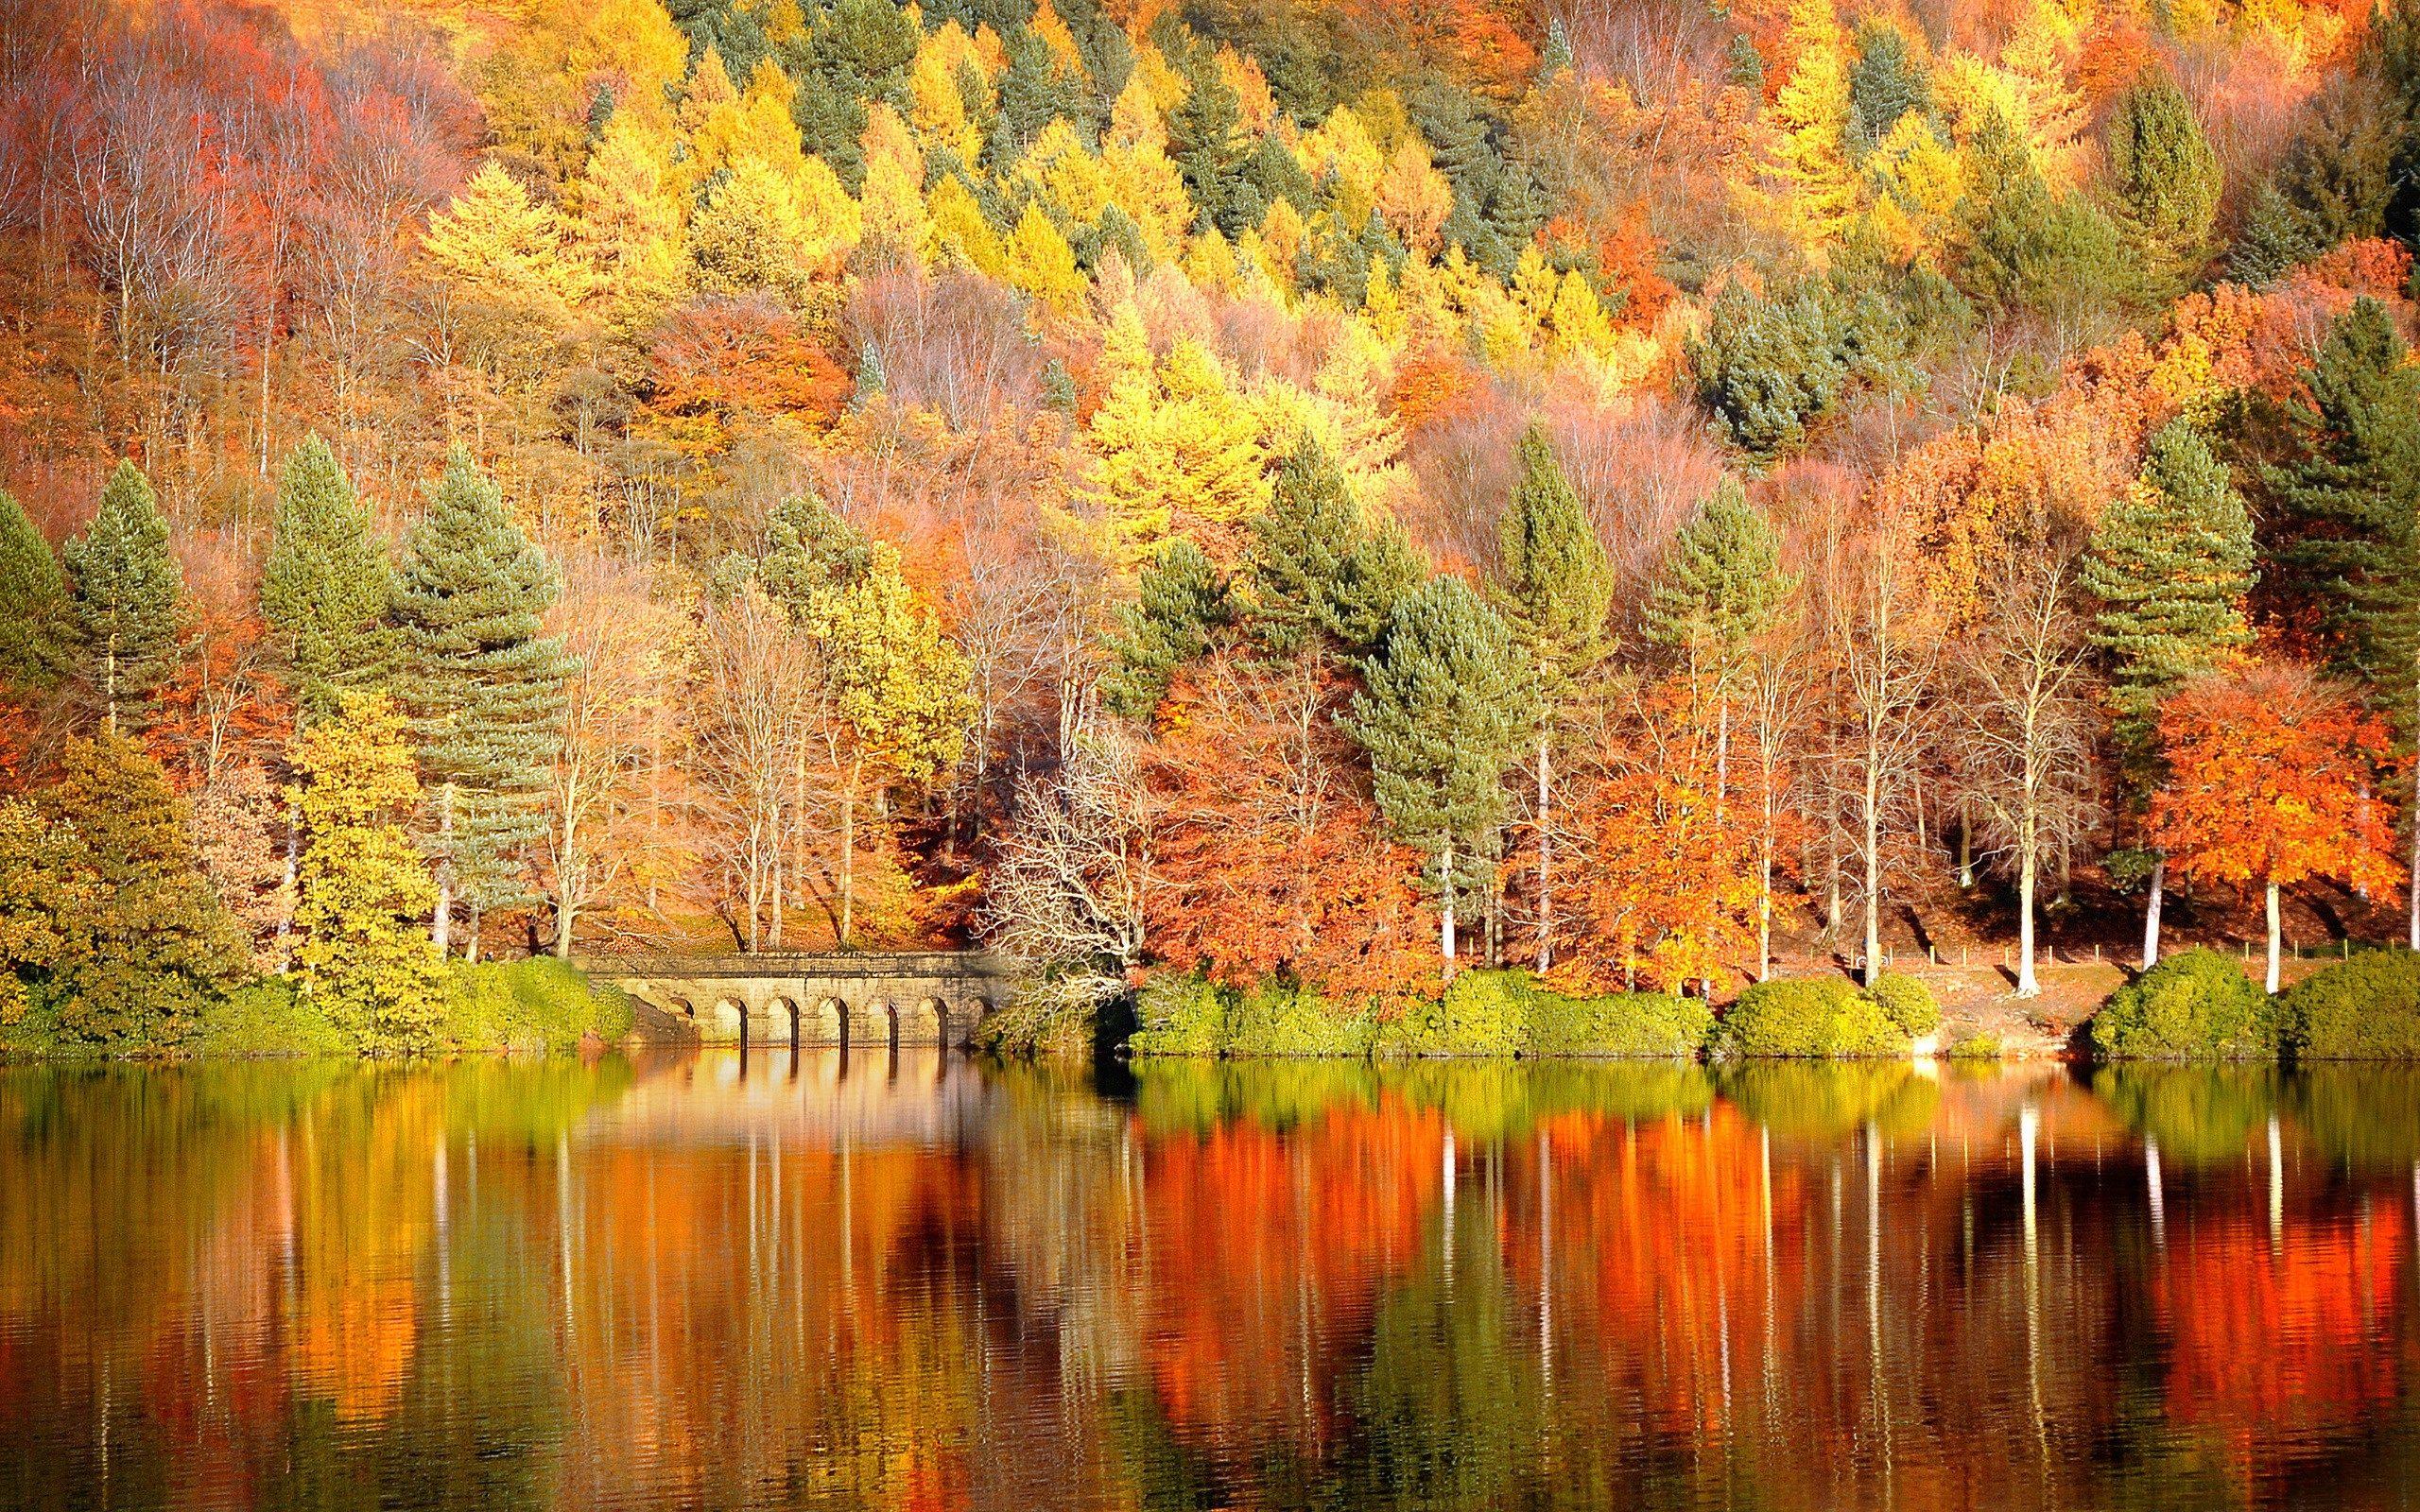 2560x1600 Free Screensaver Fall Fall Wallpaper Free Fall Wallpaper Fall Desktop Backgrounds